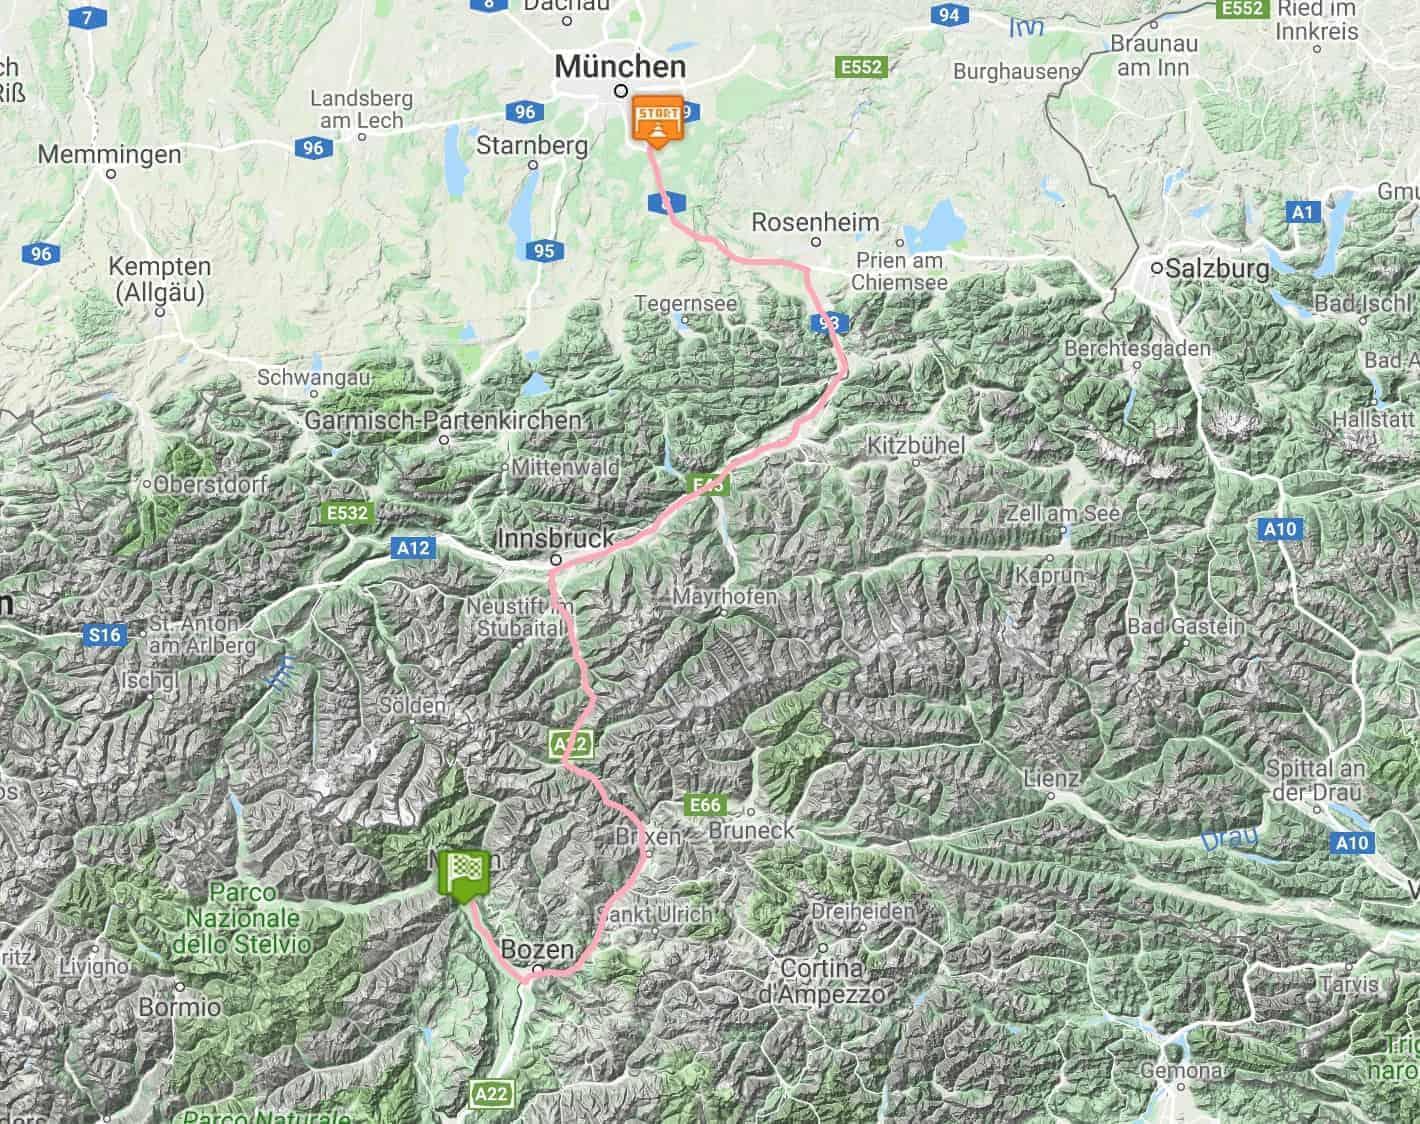 GPS_Tracks_14_06_2019